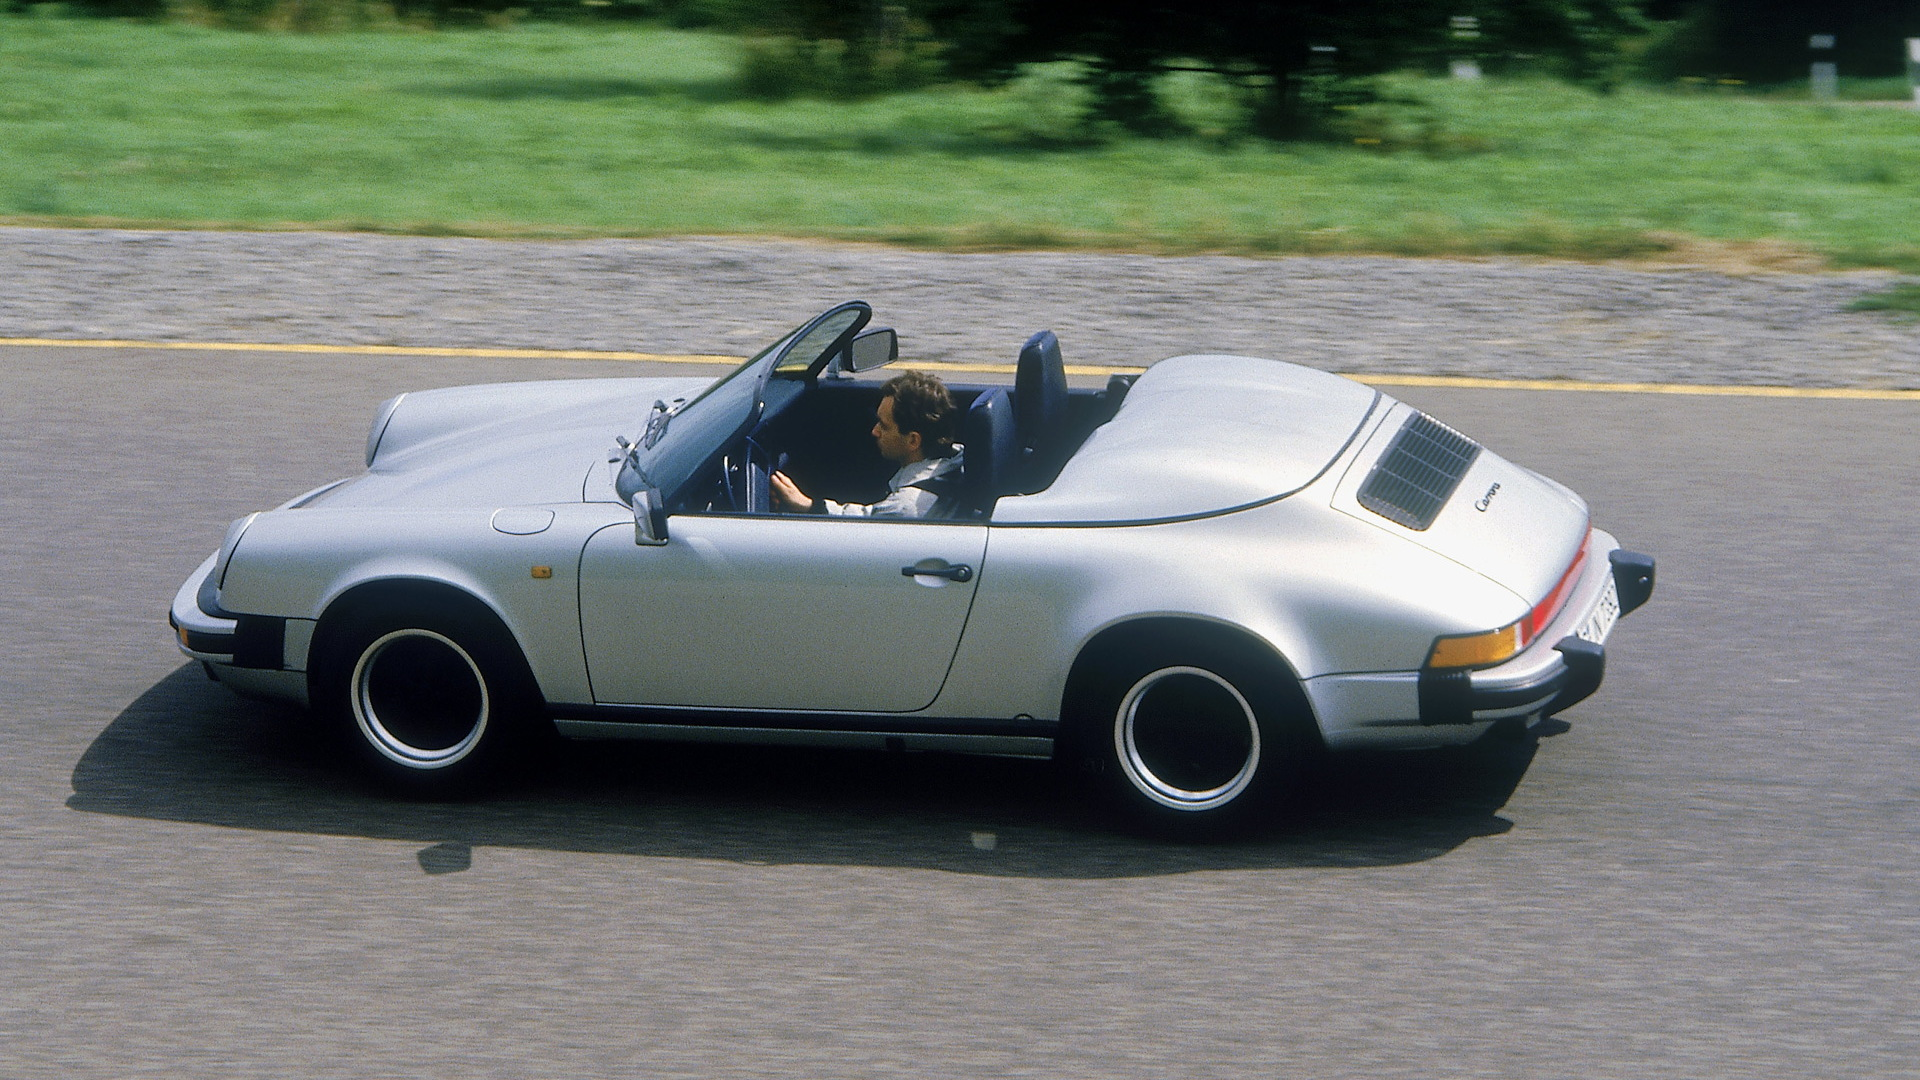 1989 Porsche 911 Carrera 3.2 Speedster